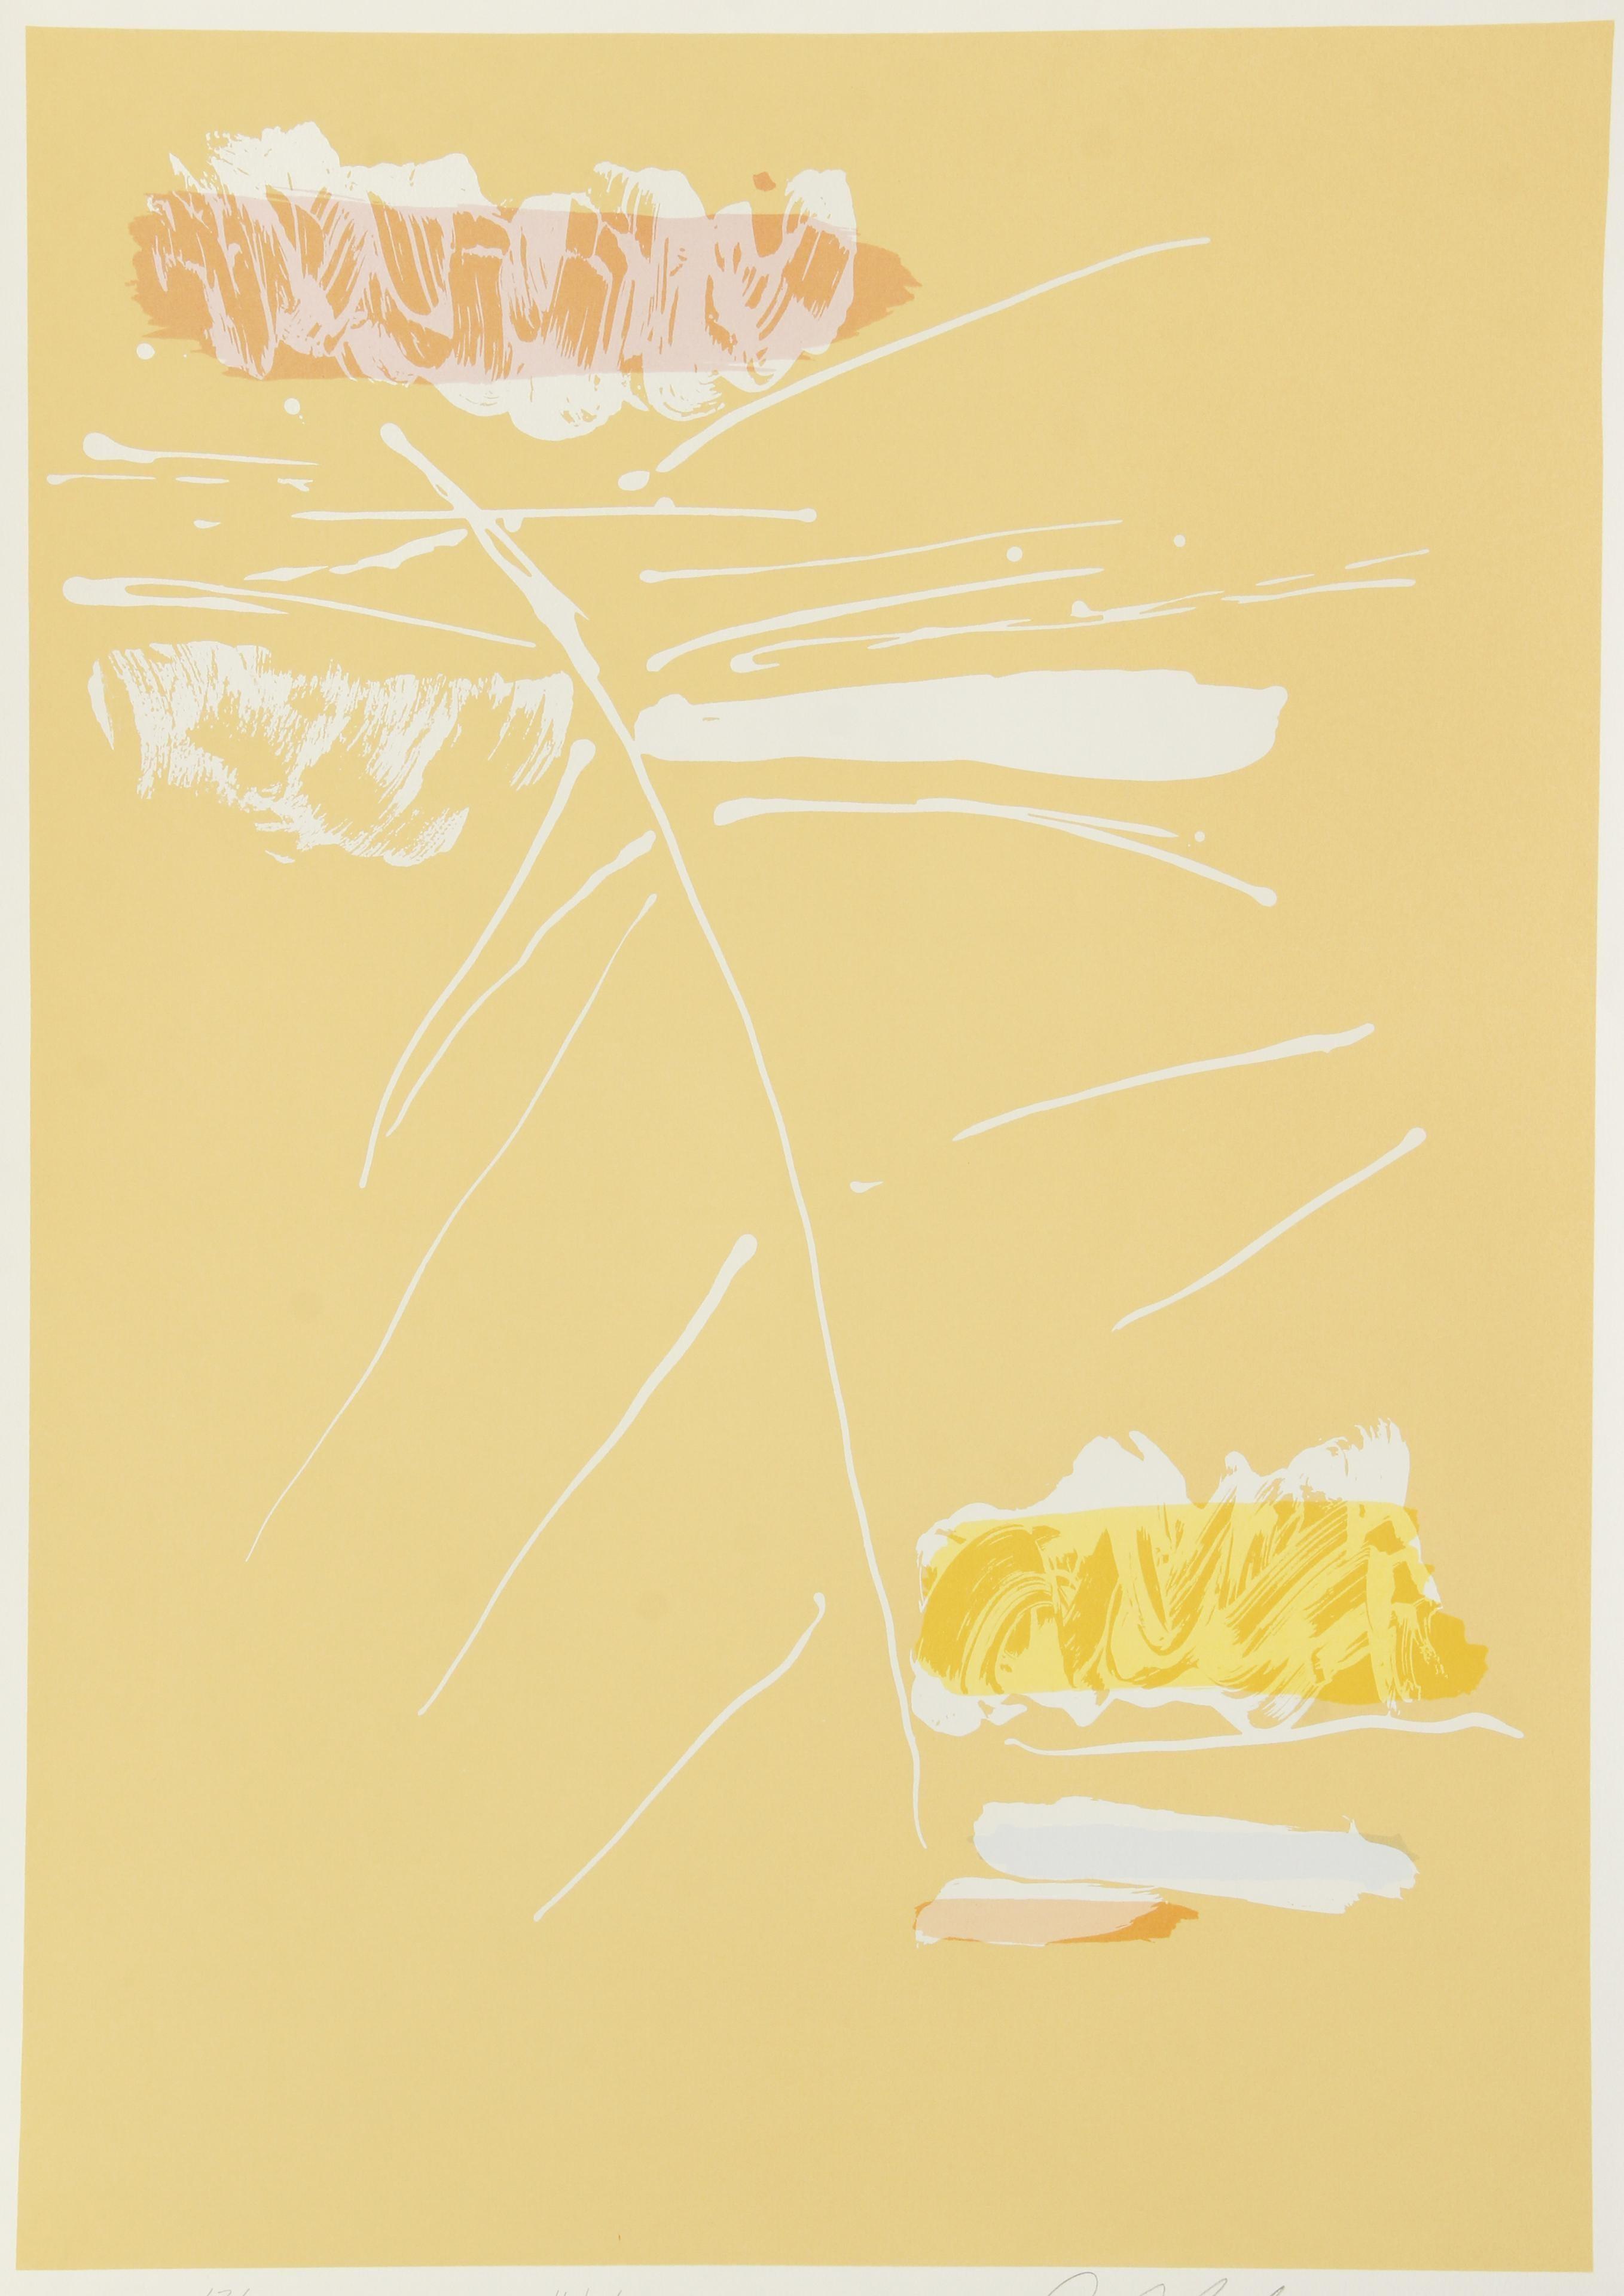 Veeda, Abstract Expressionist Silkscreen by Dan Christensen